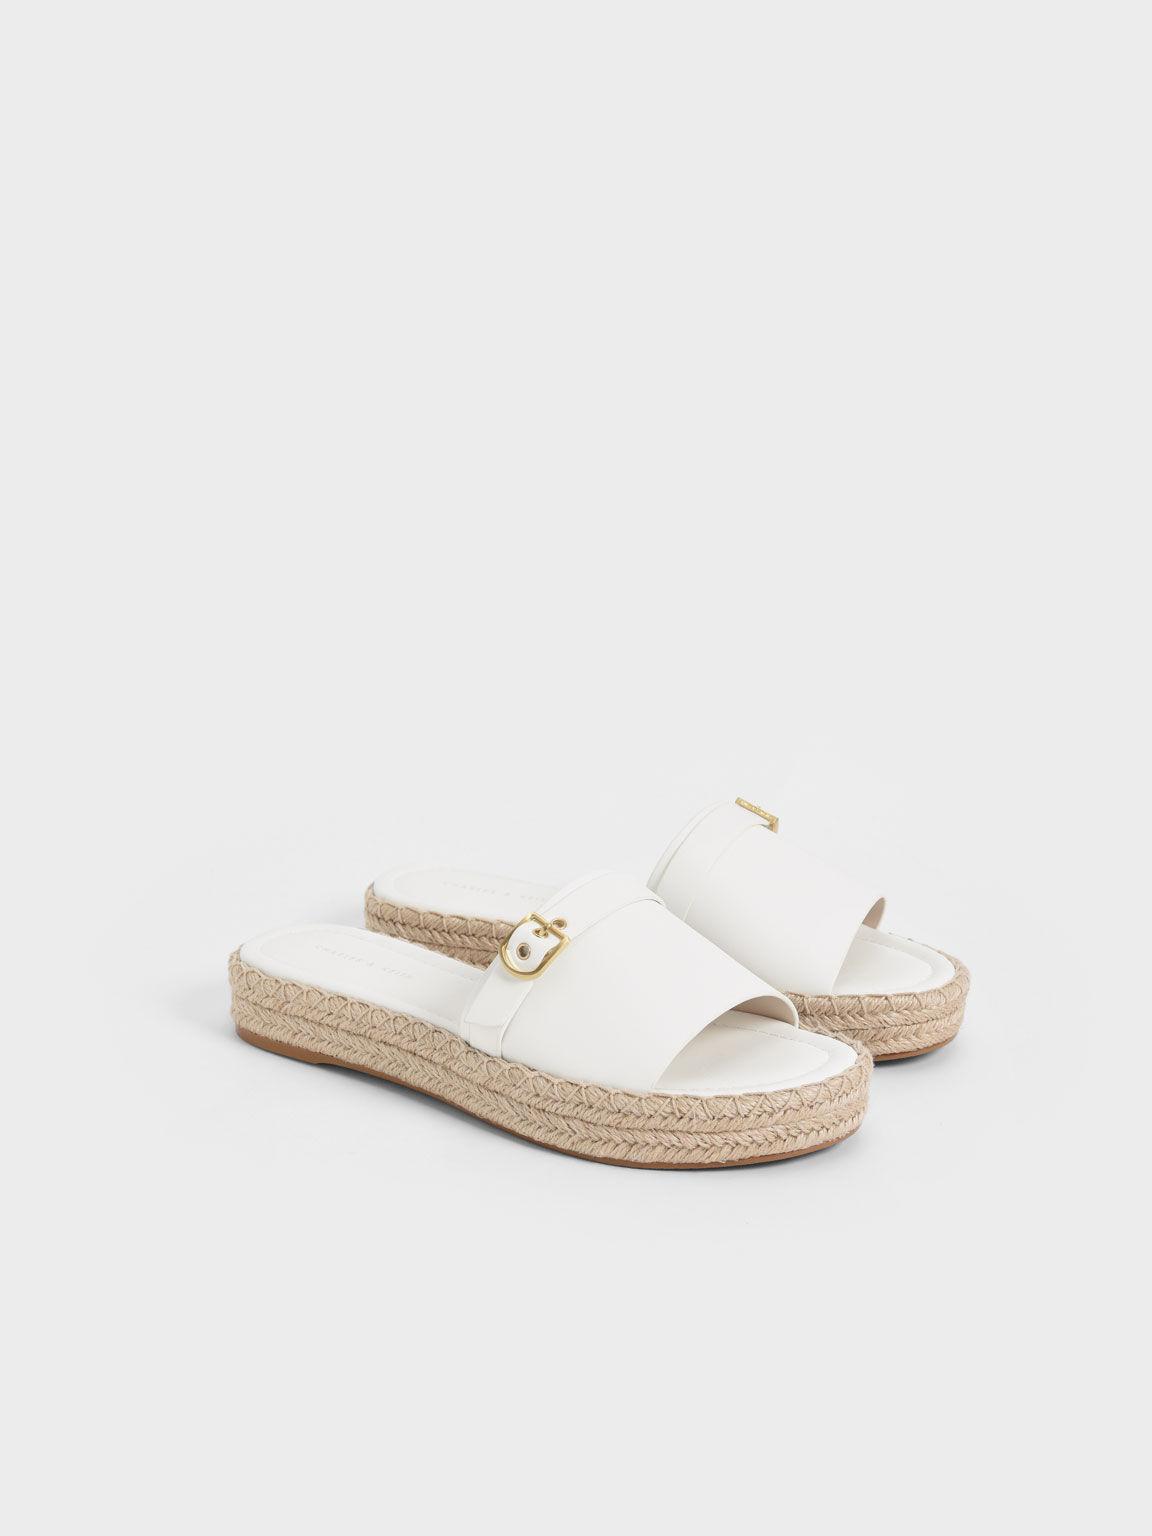 Buckle Strap Espadrille Sandals, White, hi-res